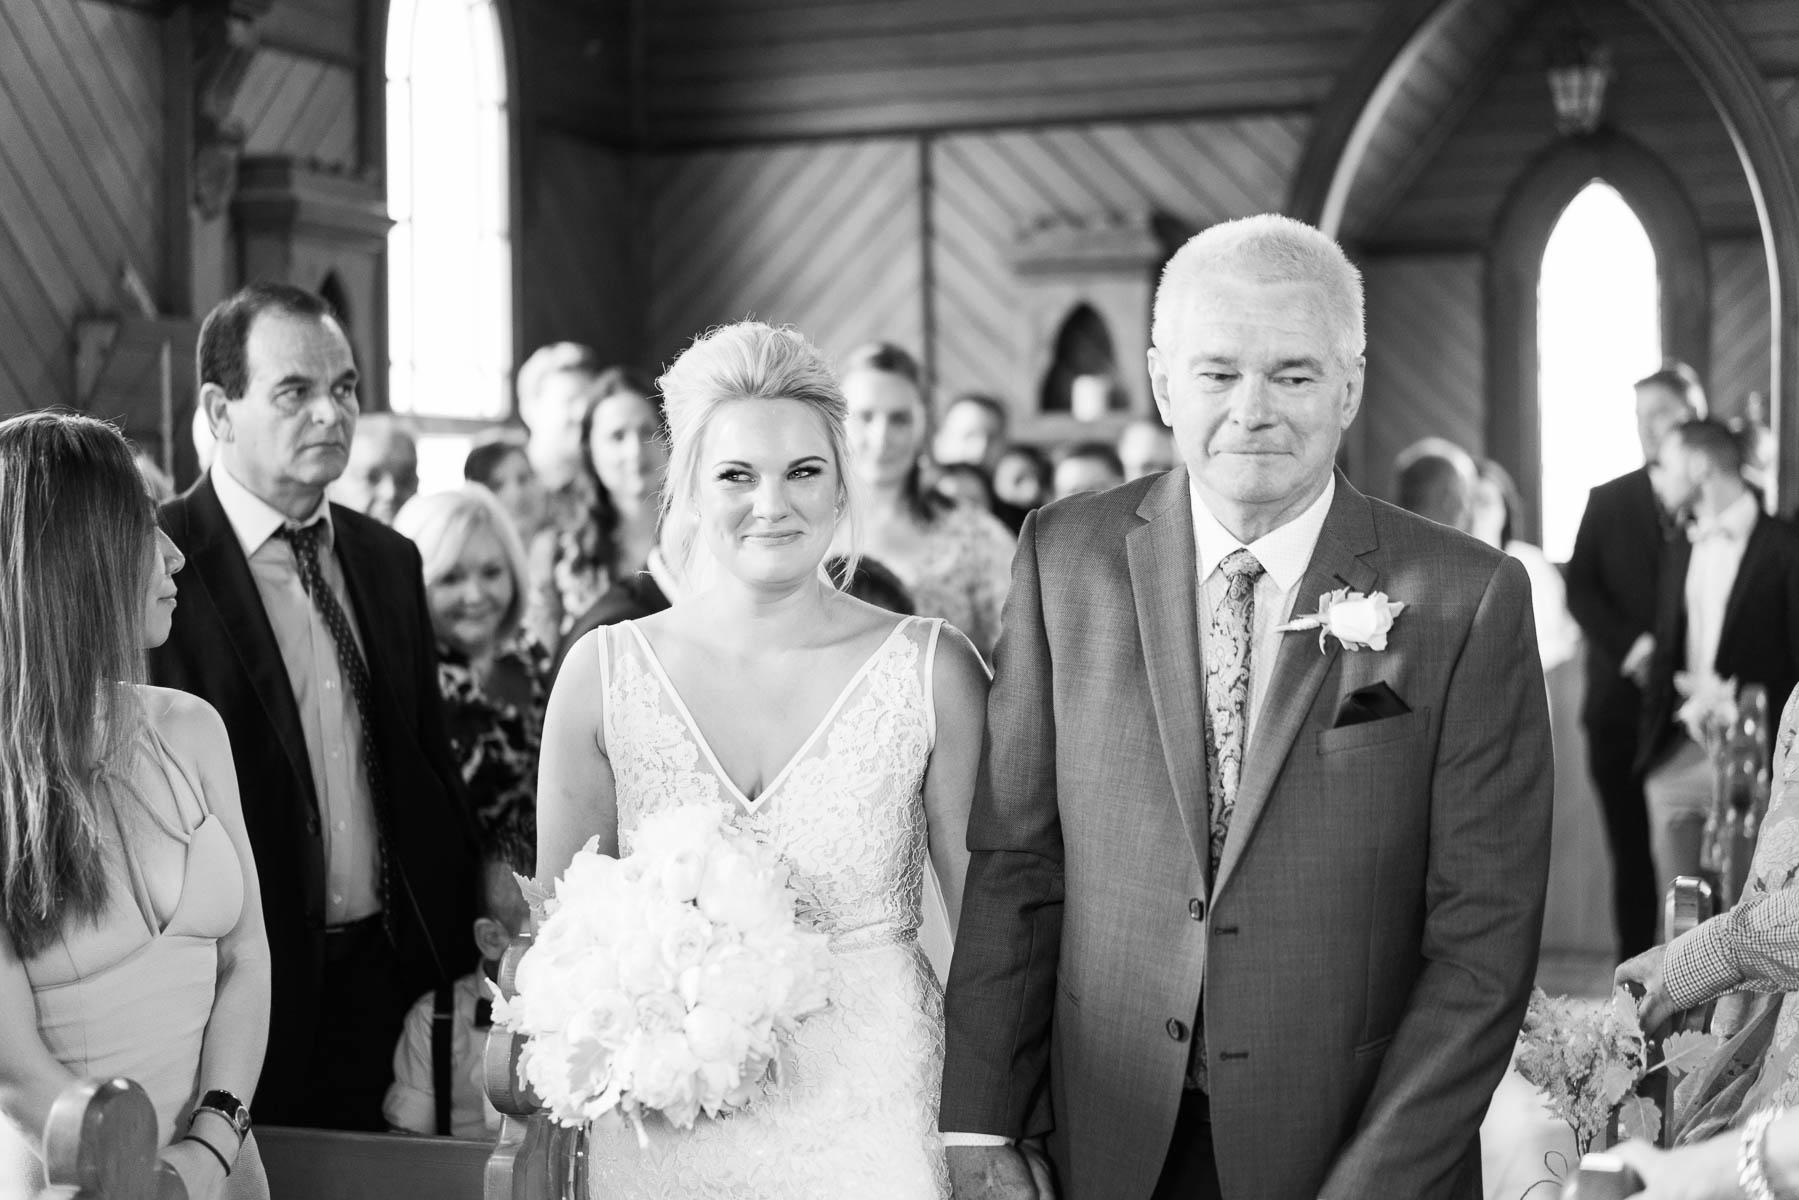 trenavin-chapel-phillip-island-wedding-heart+soul-weddings-sally-sean-00158.jpg